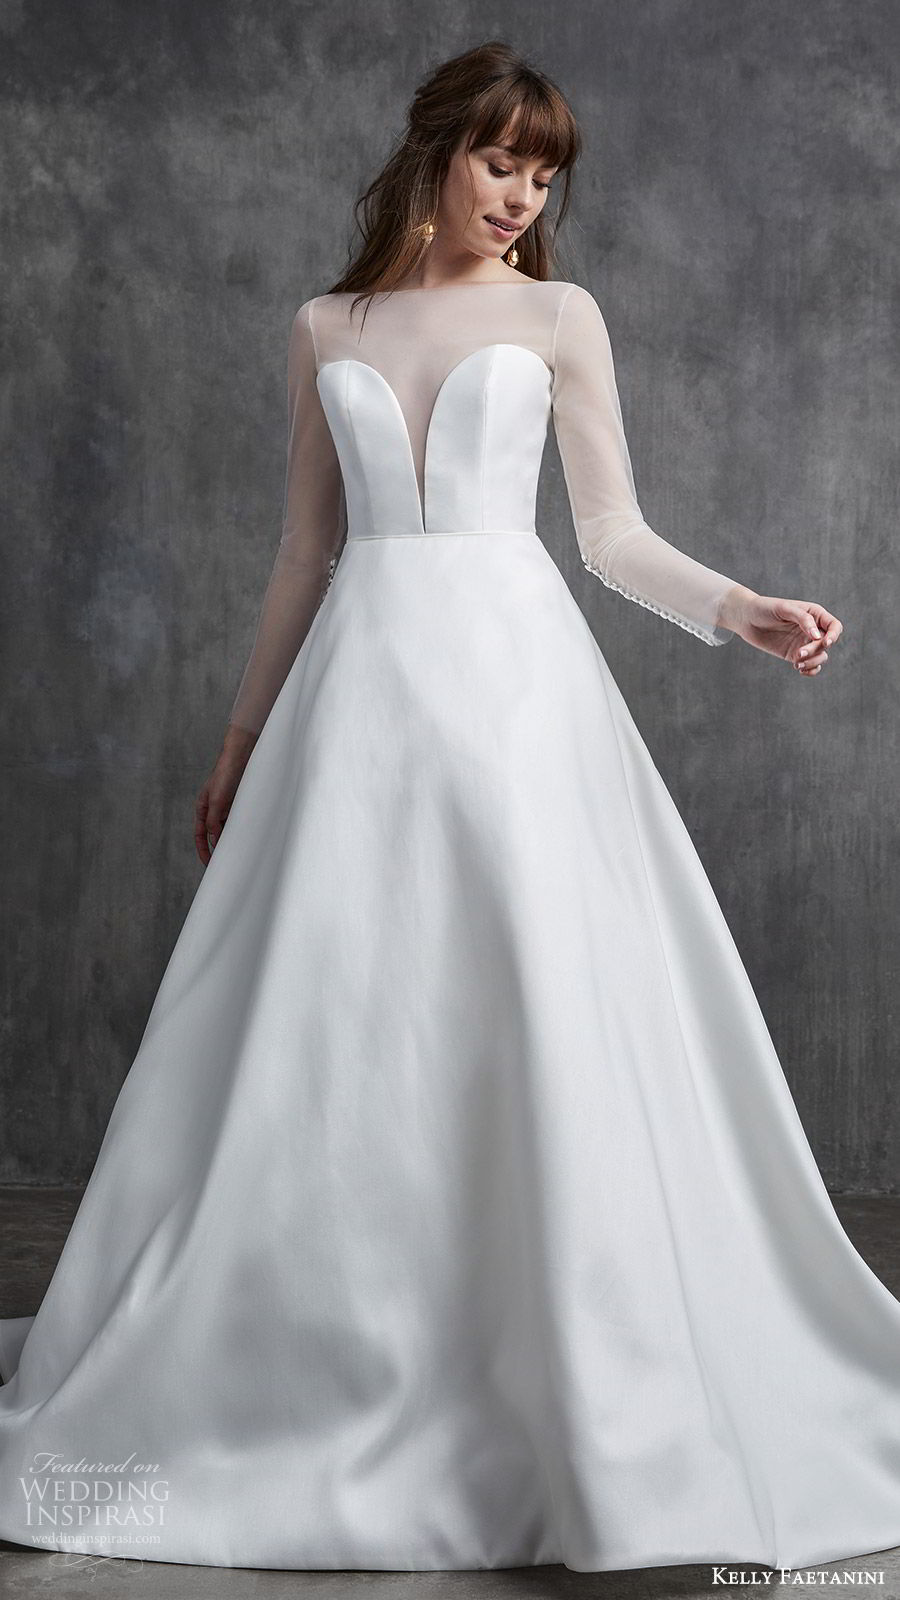 kelly faetanini spring 2020 bridal illusion long sleeves sheer bateau neck split sweetheart neckline a line ball gown wedding dress (4) princess elegant mv